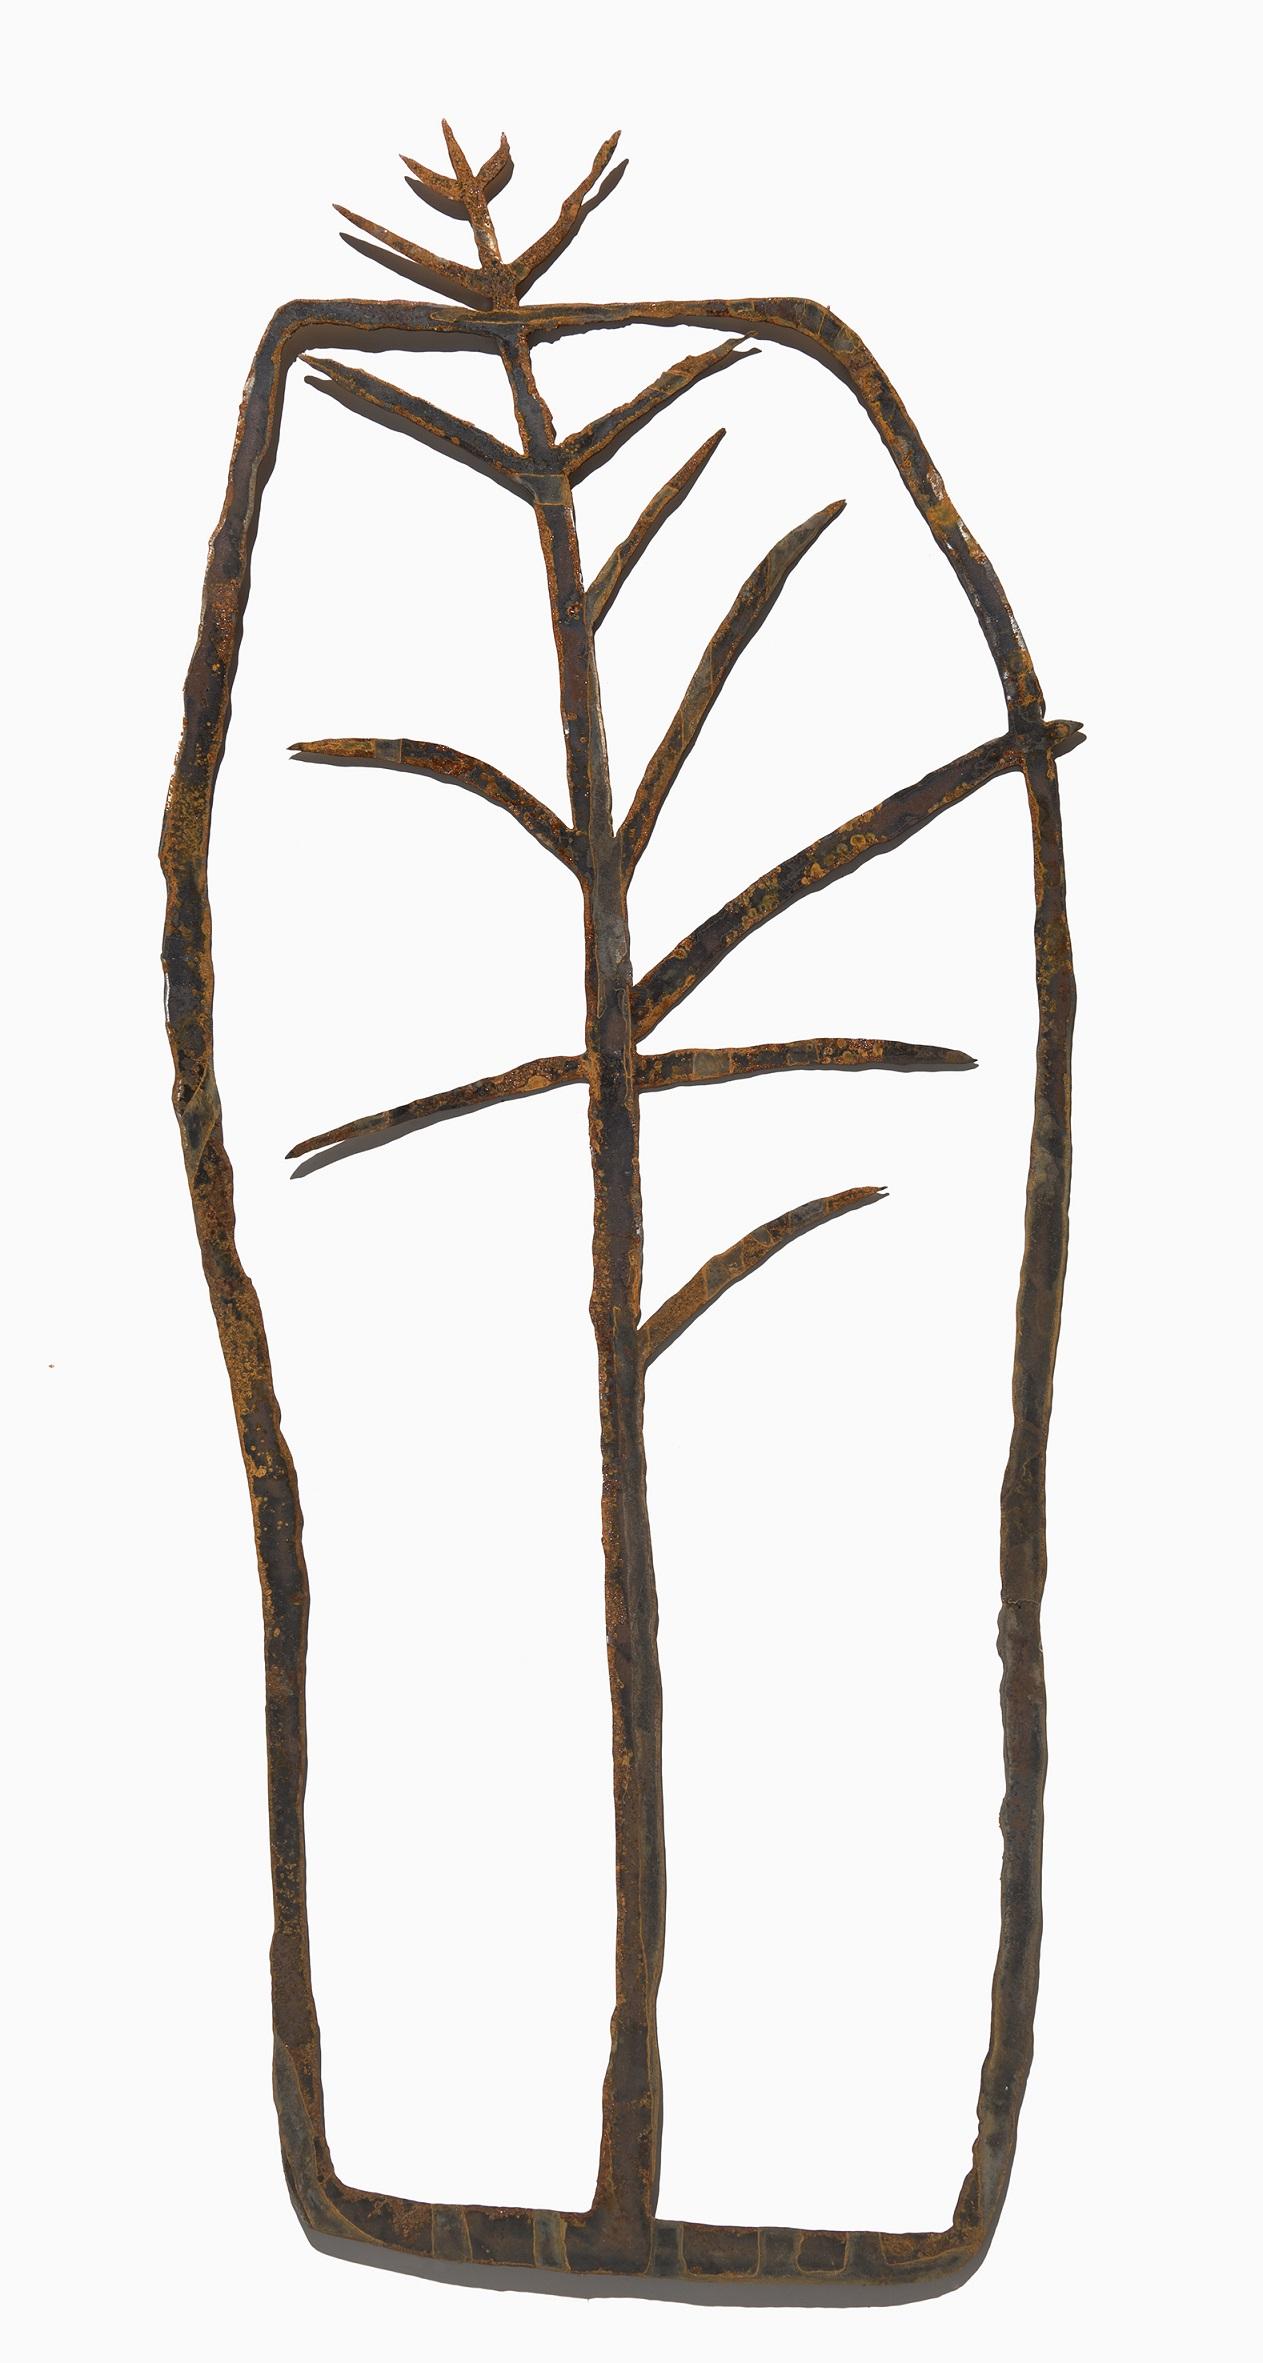 Glyphs – The Paddock I